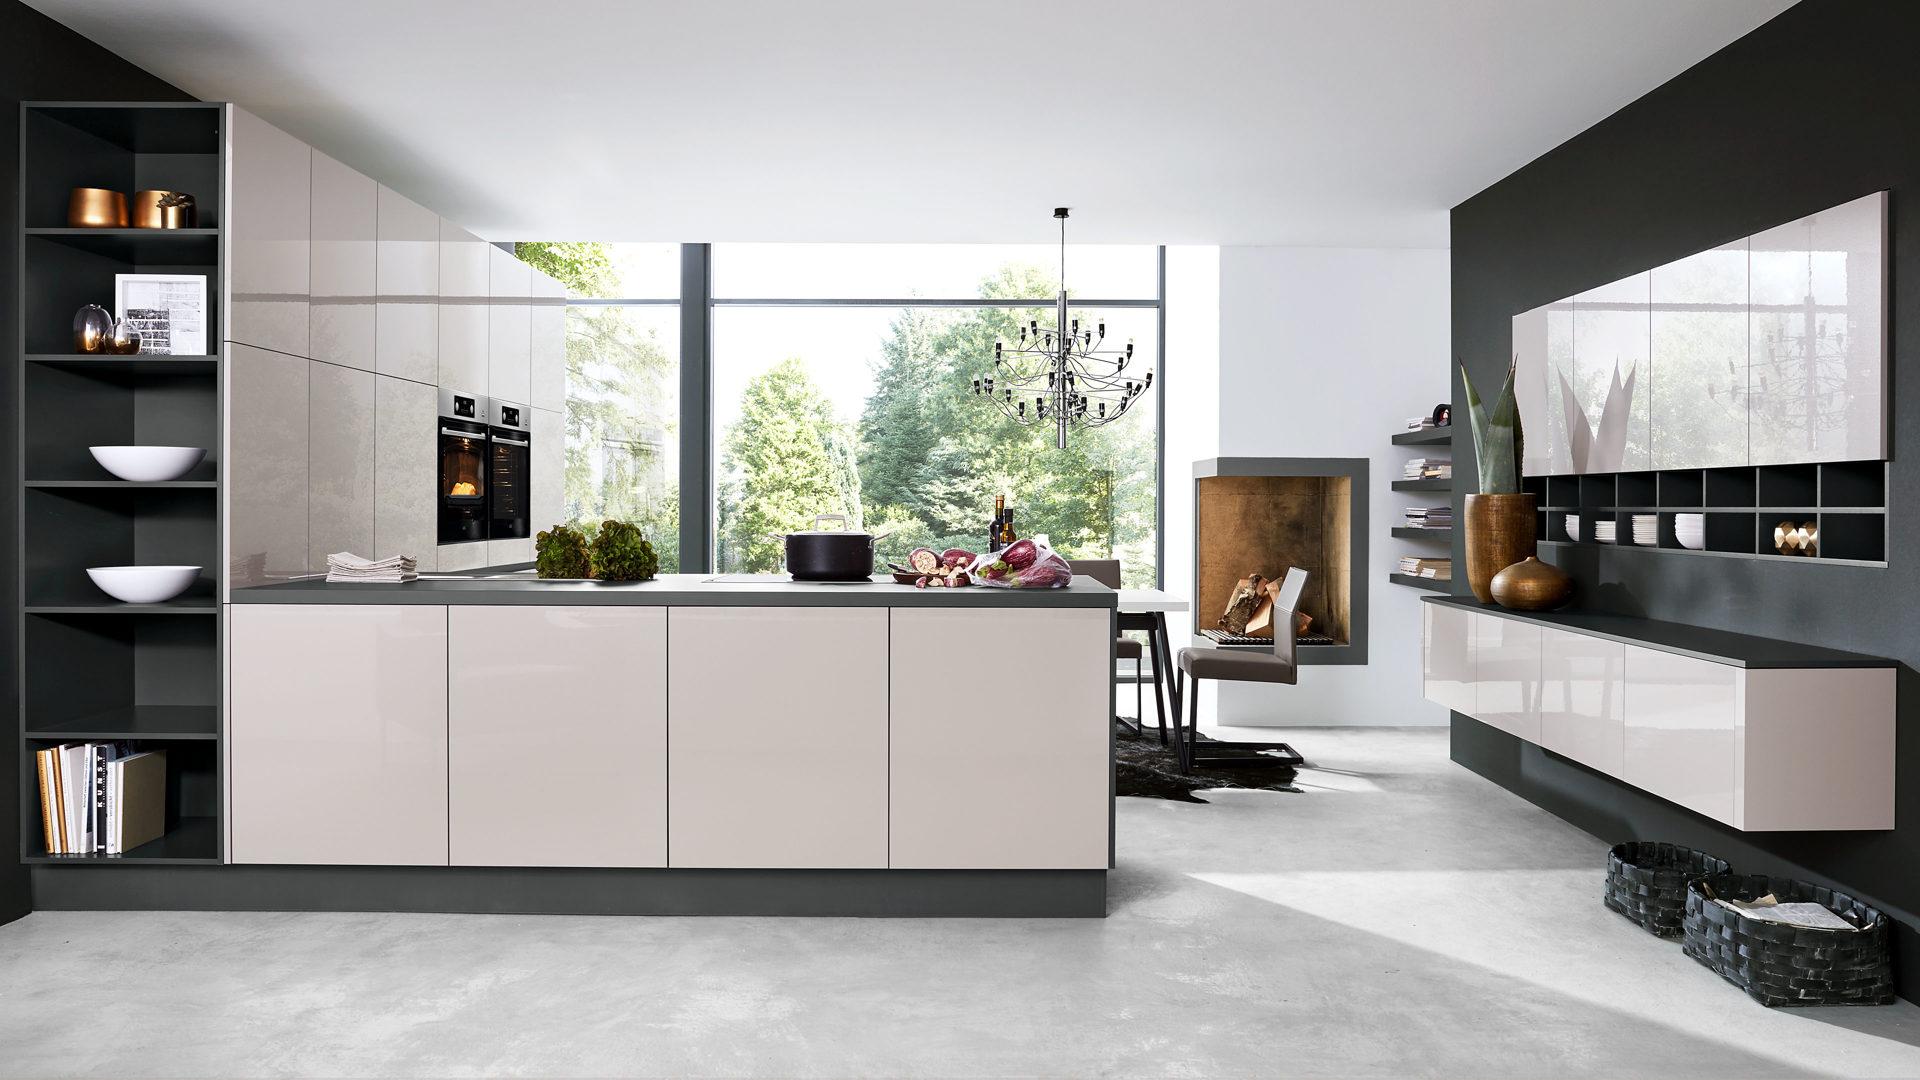 Culineo Küche mit AEG Einbaugeräten, seidengraue Fronten & onyxgraue  Kunststoffoberflächen, onxygraue Arbeitsplatten